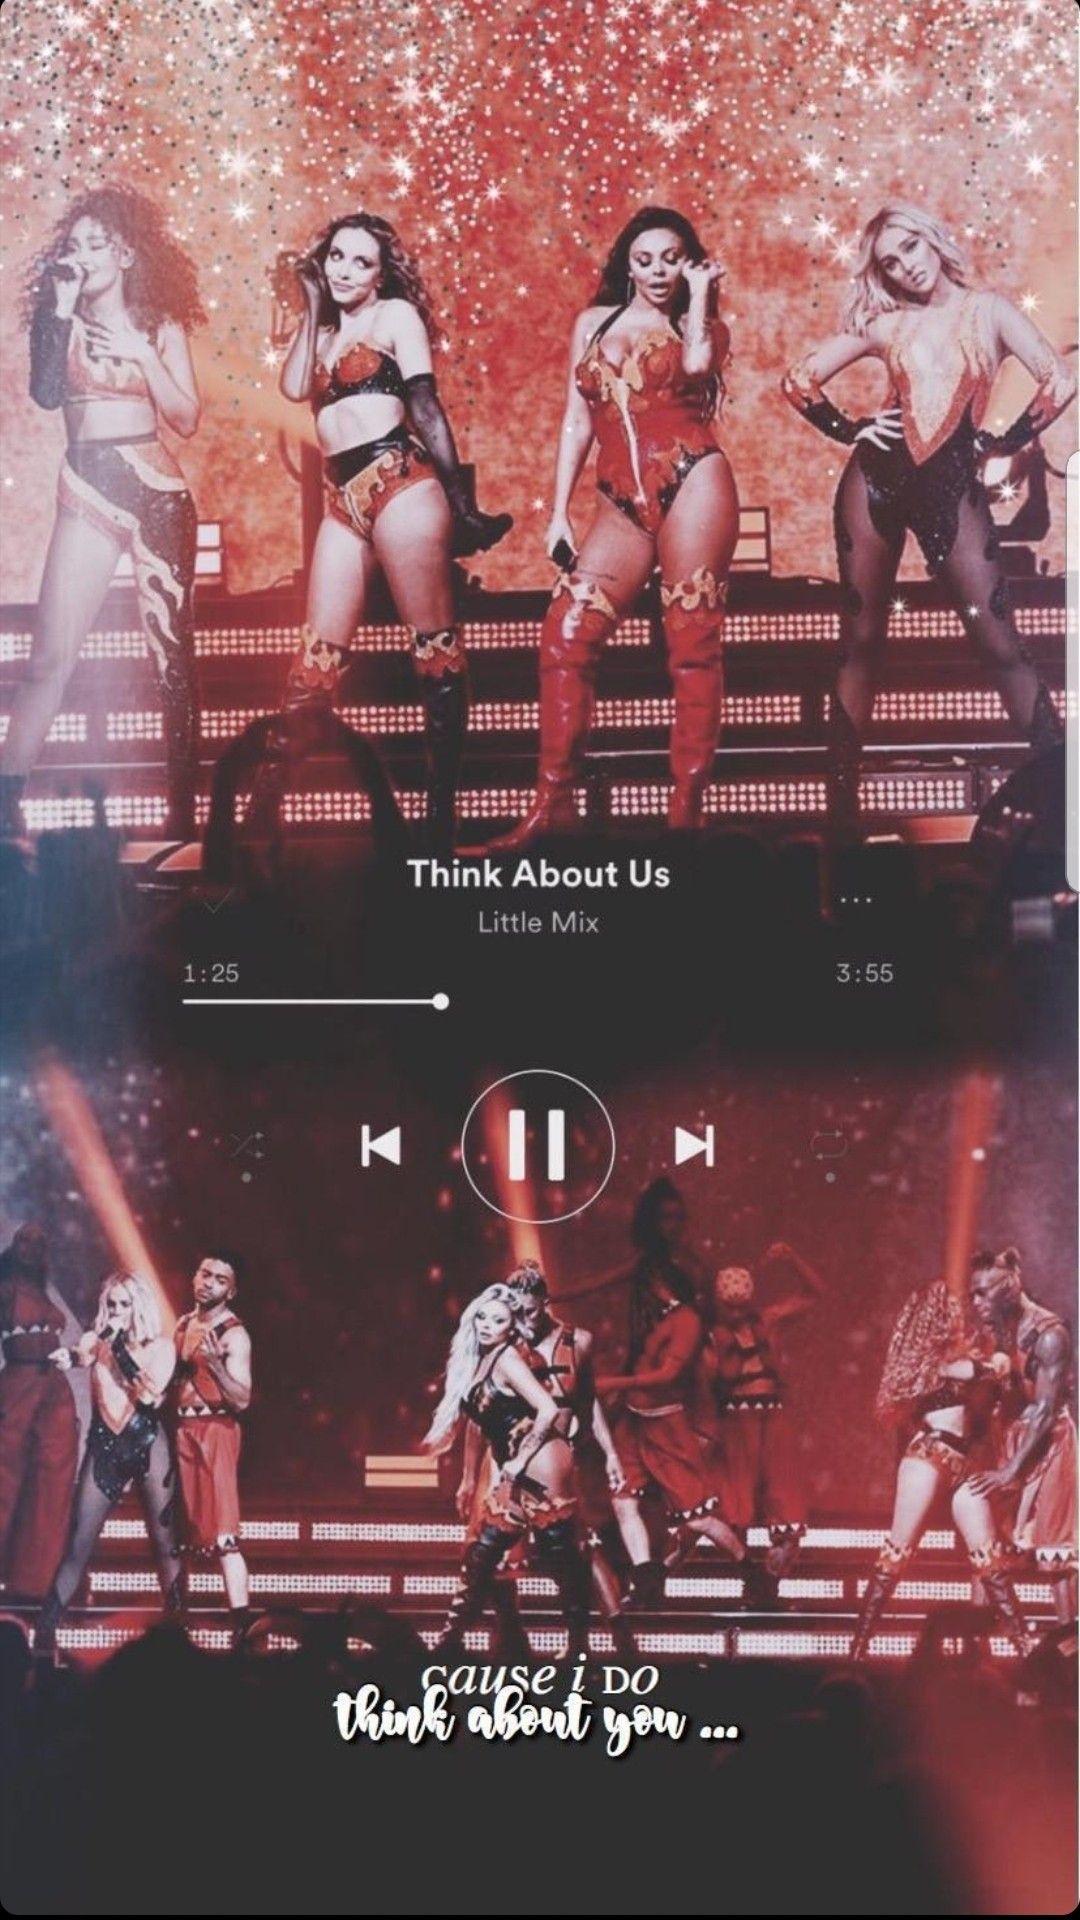 Lm5 Tour Think About Us Play Credit Lm Inyourera Little Mix Little Mix Girls Little Mix Lyrics